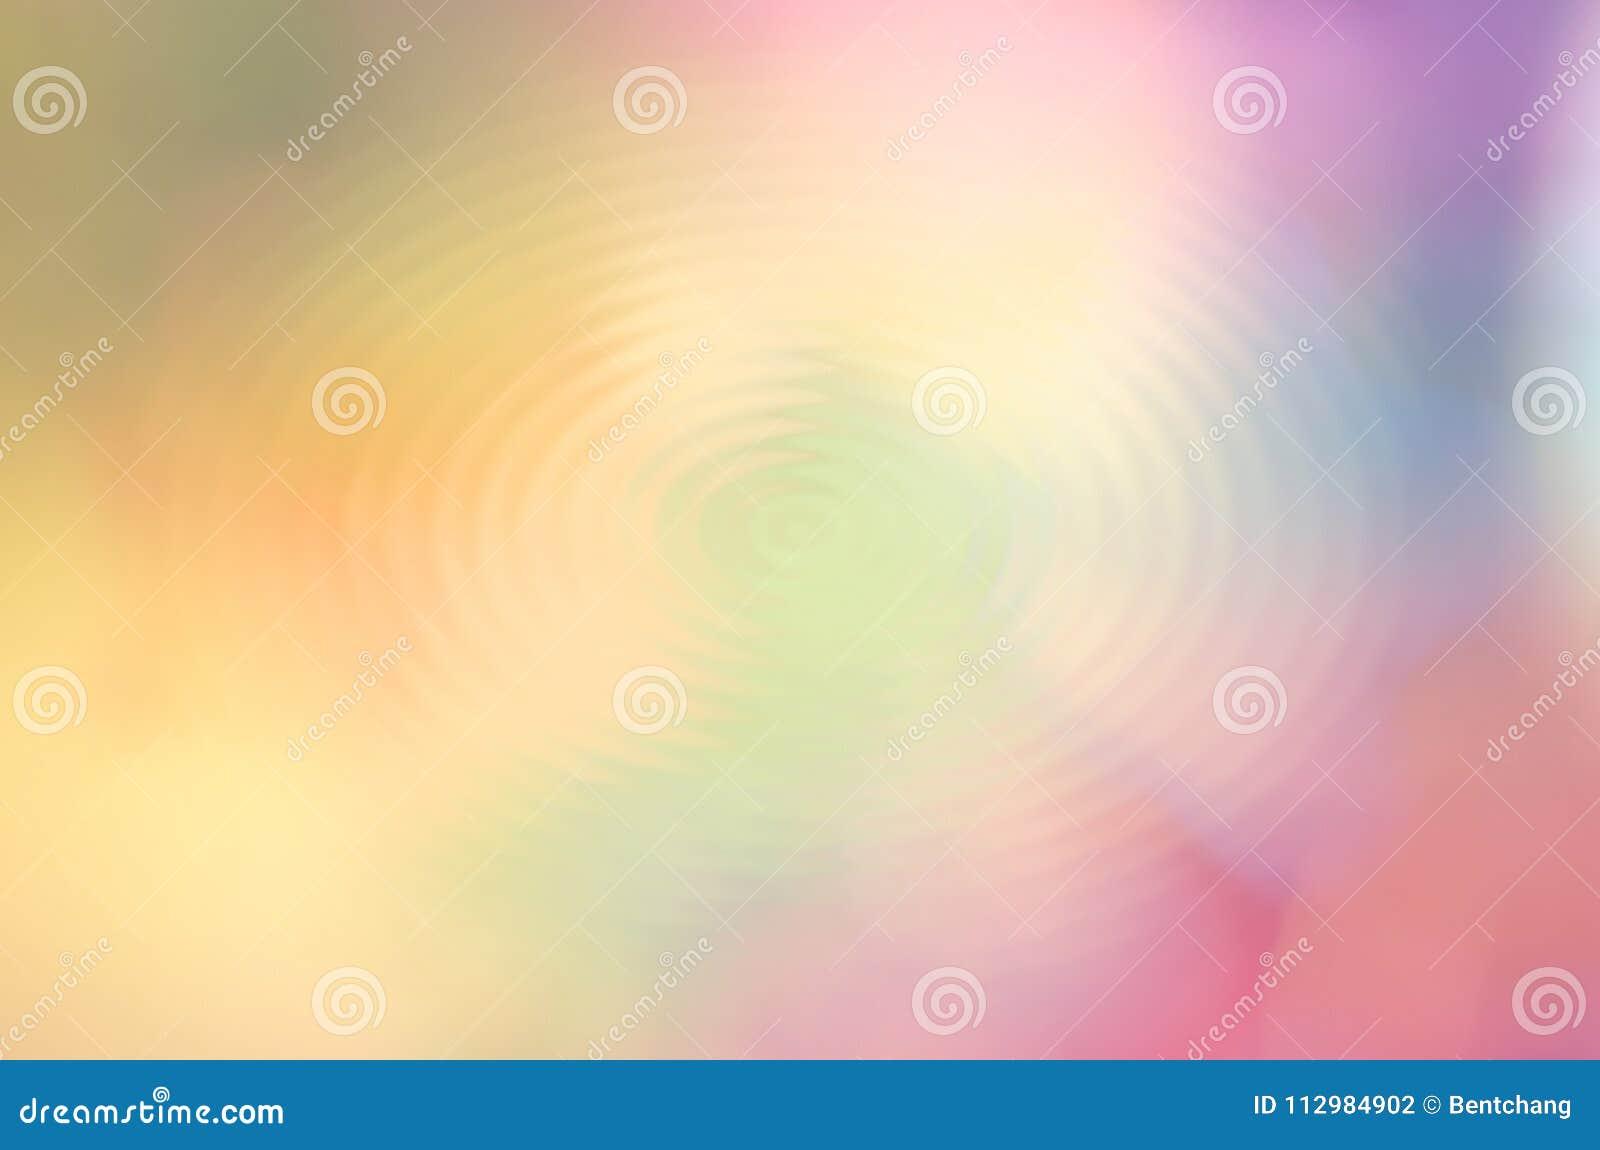 Abstract motion generative design art background. Blur, pattern, imagination, light & artwork.